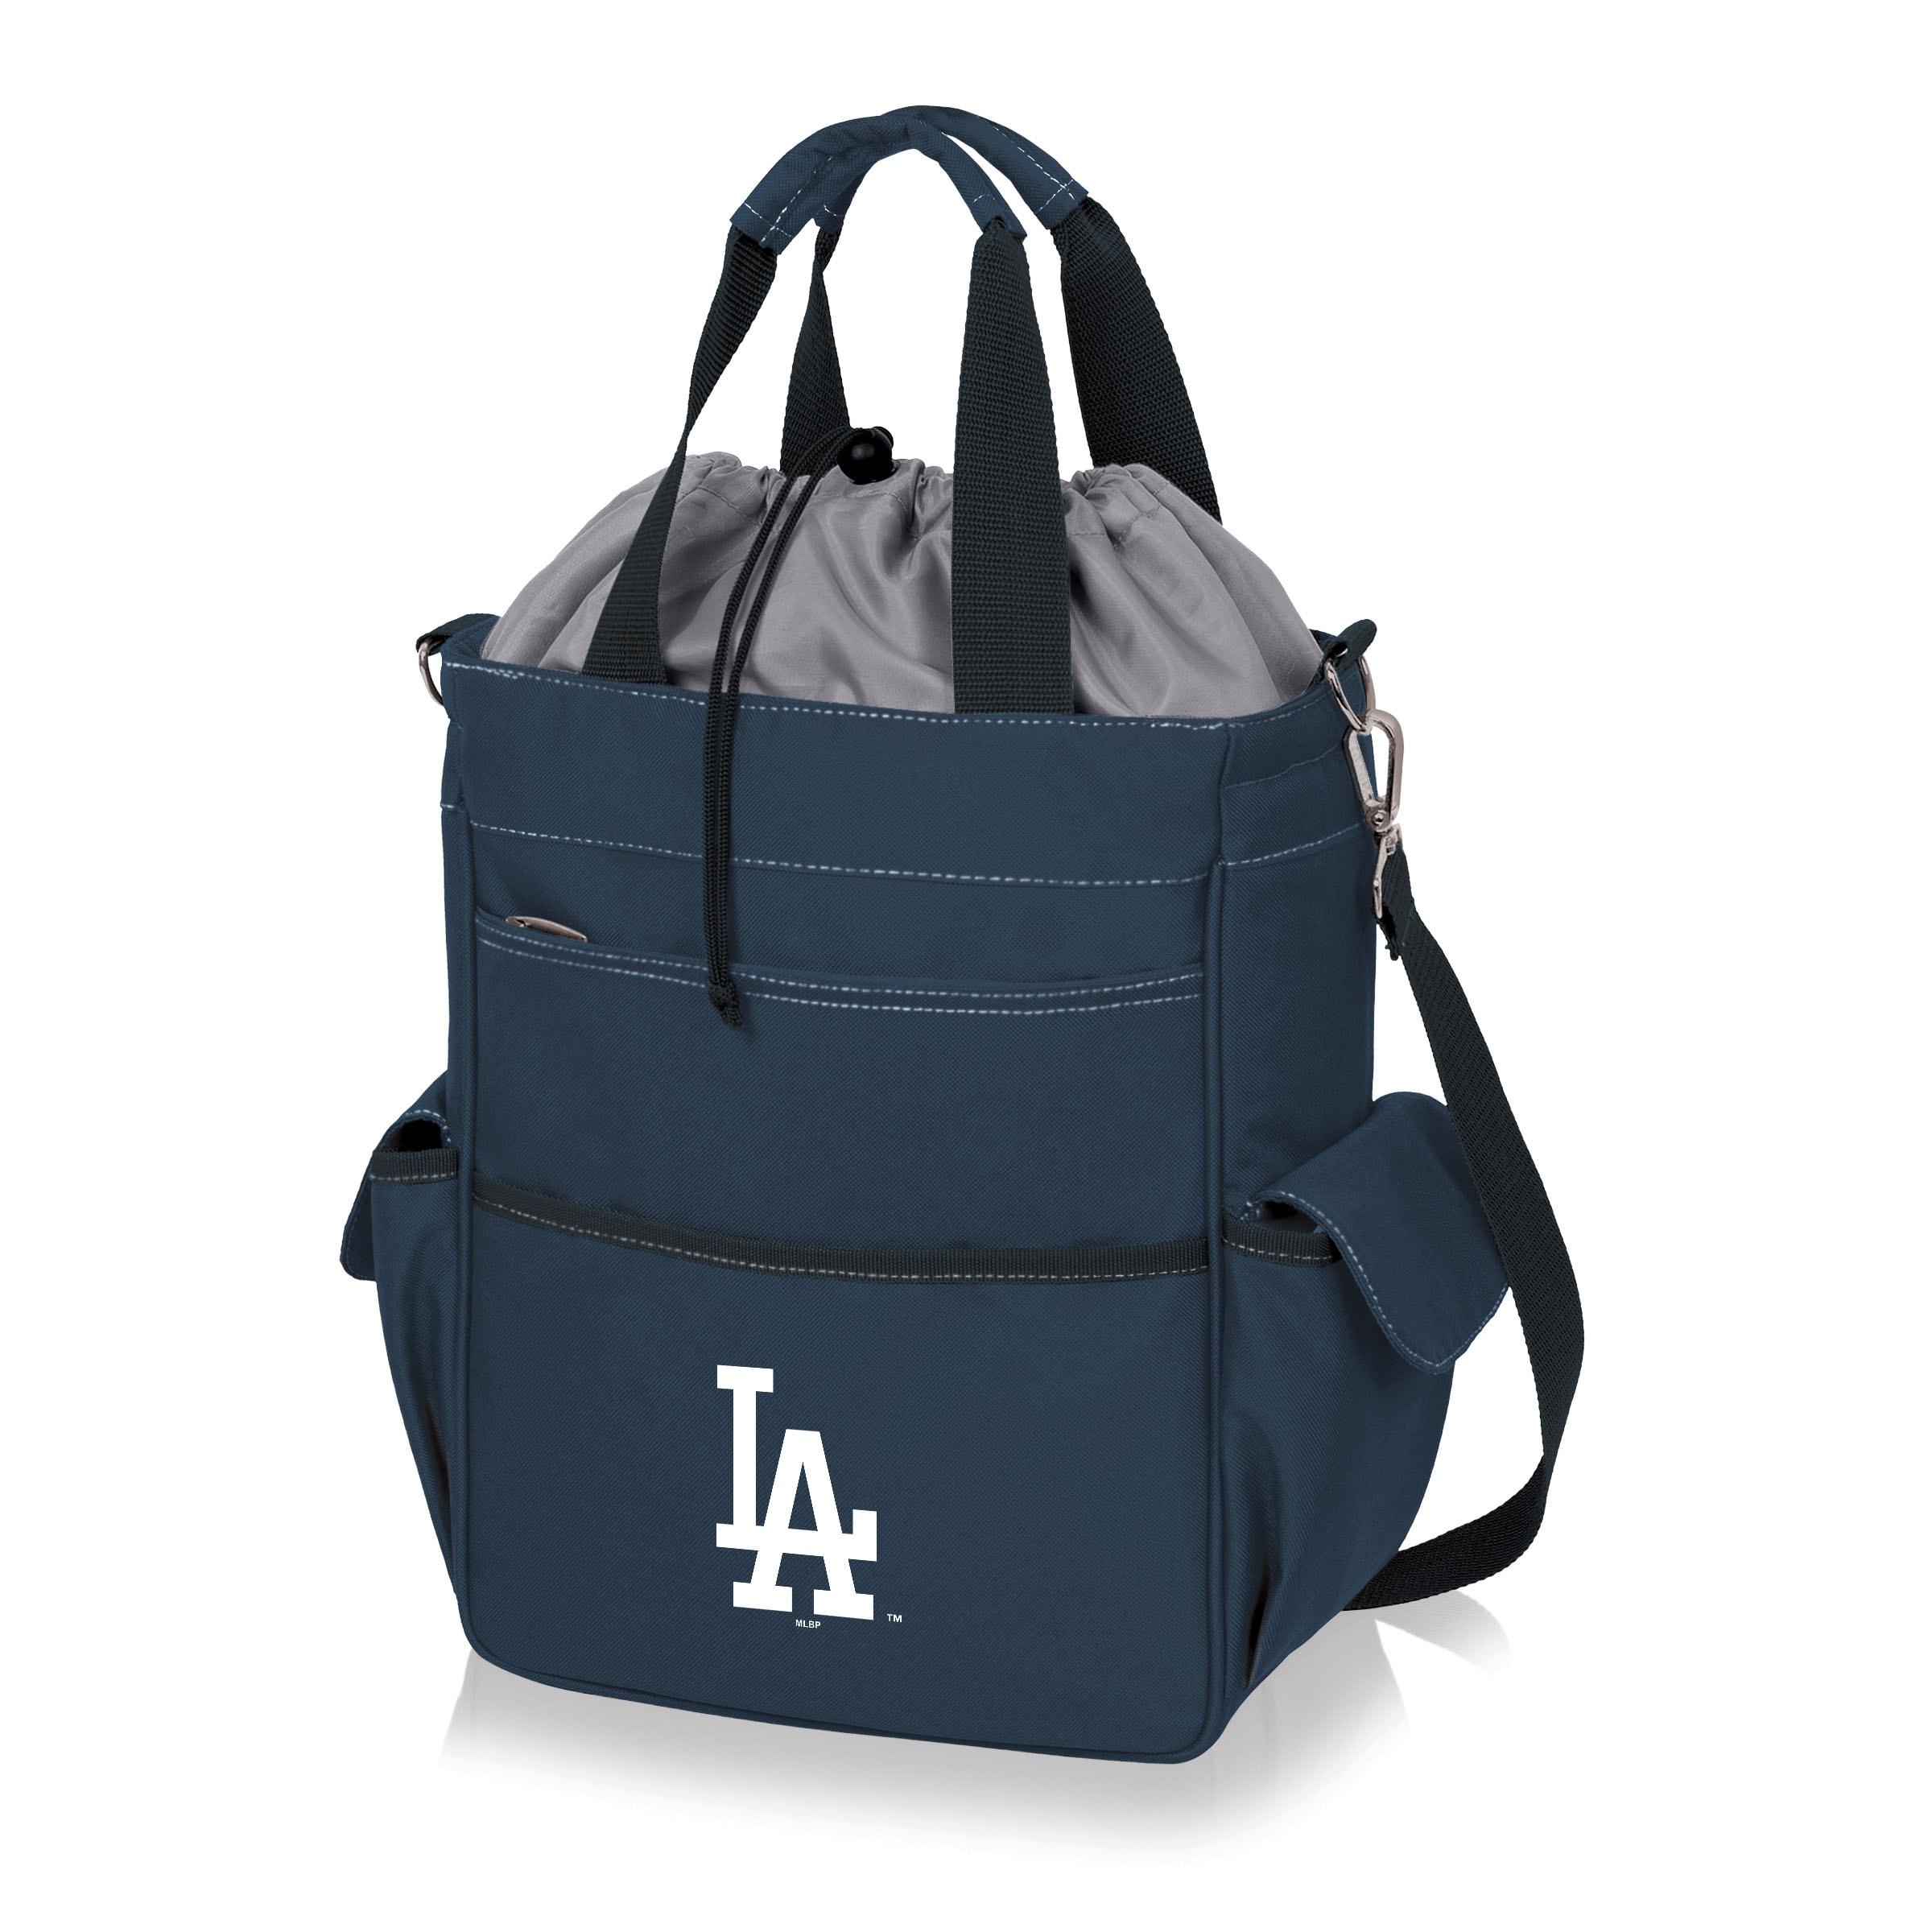 Los Angeles Dodgers Activo Cooler Tote - Navy